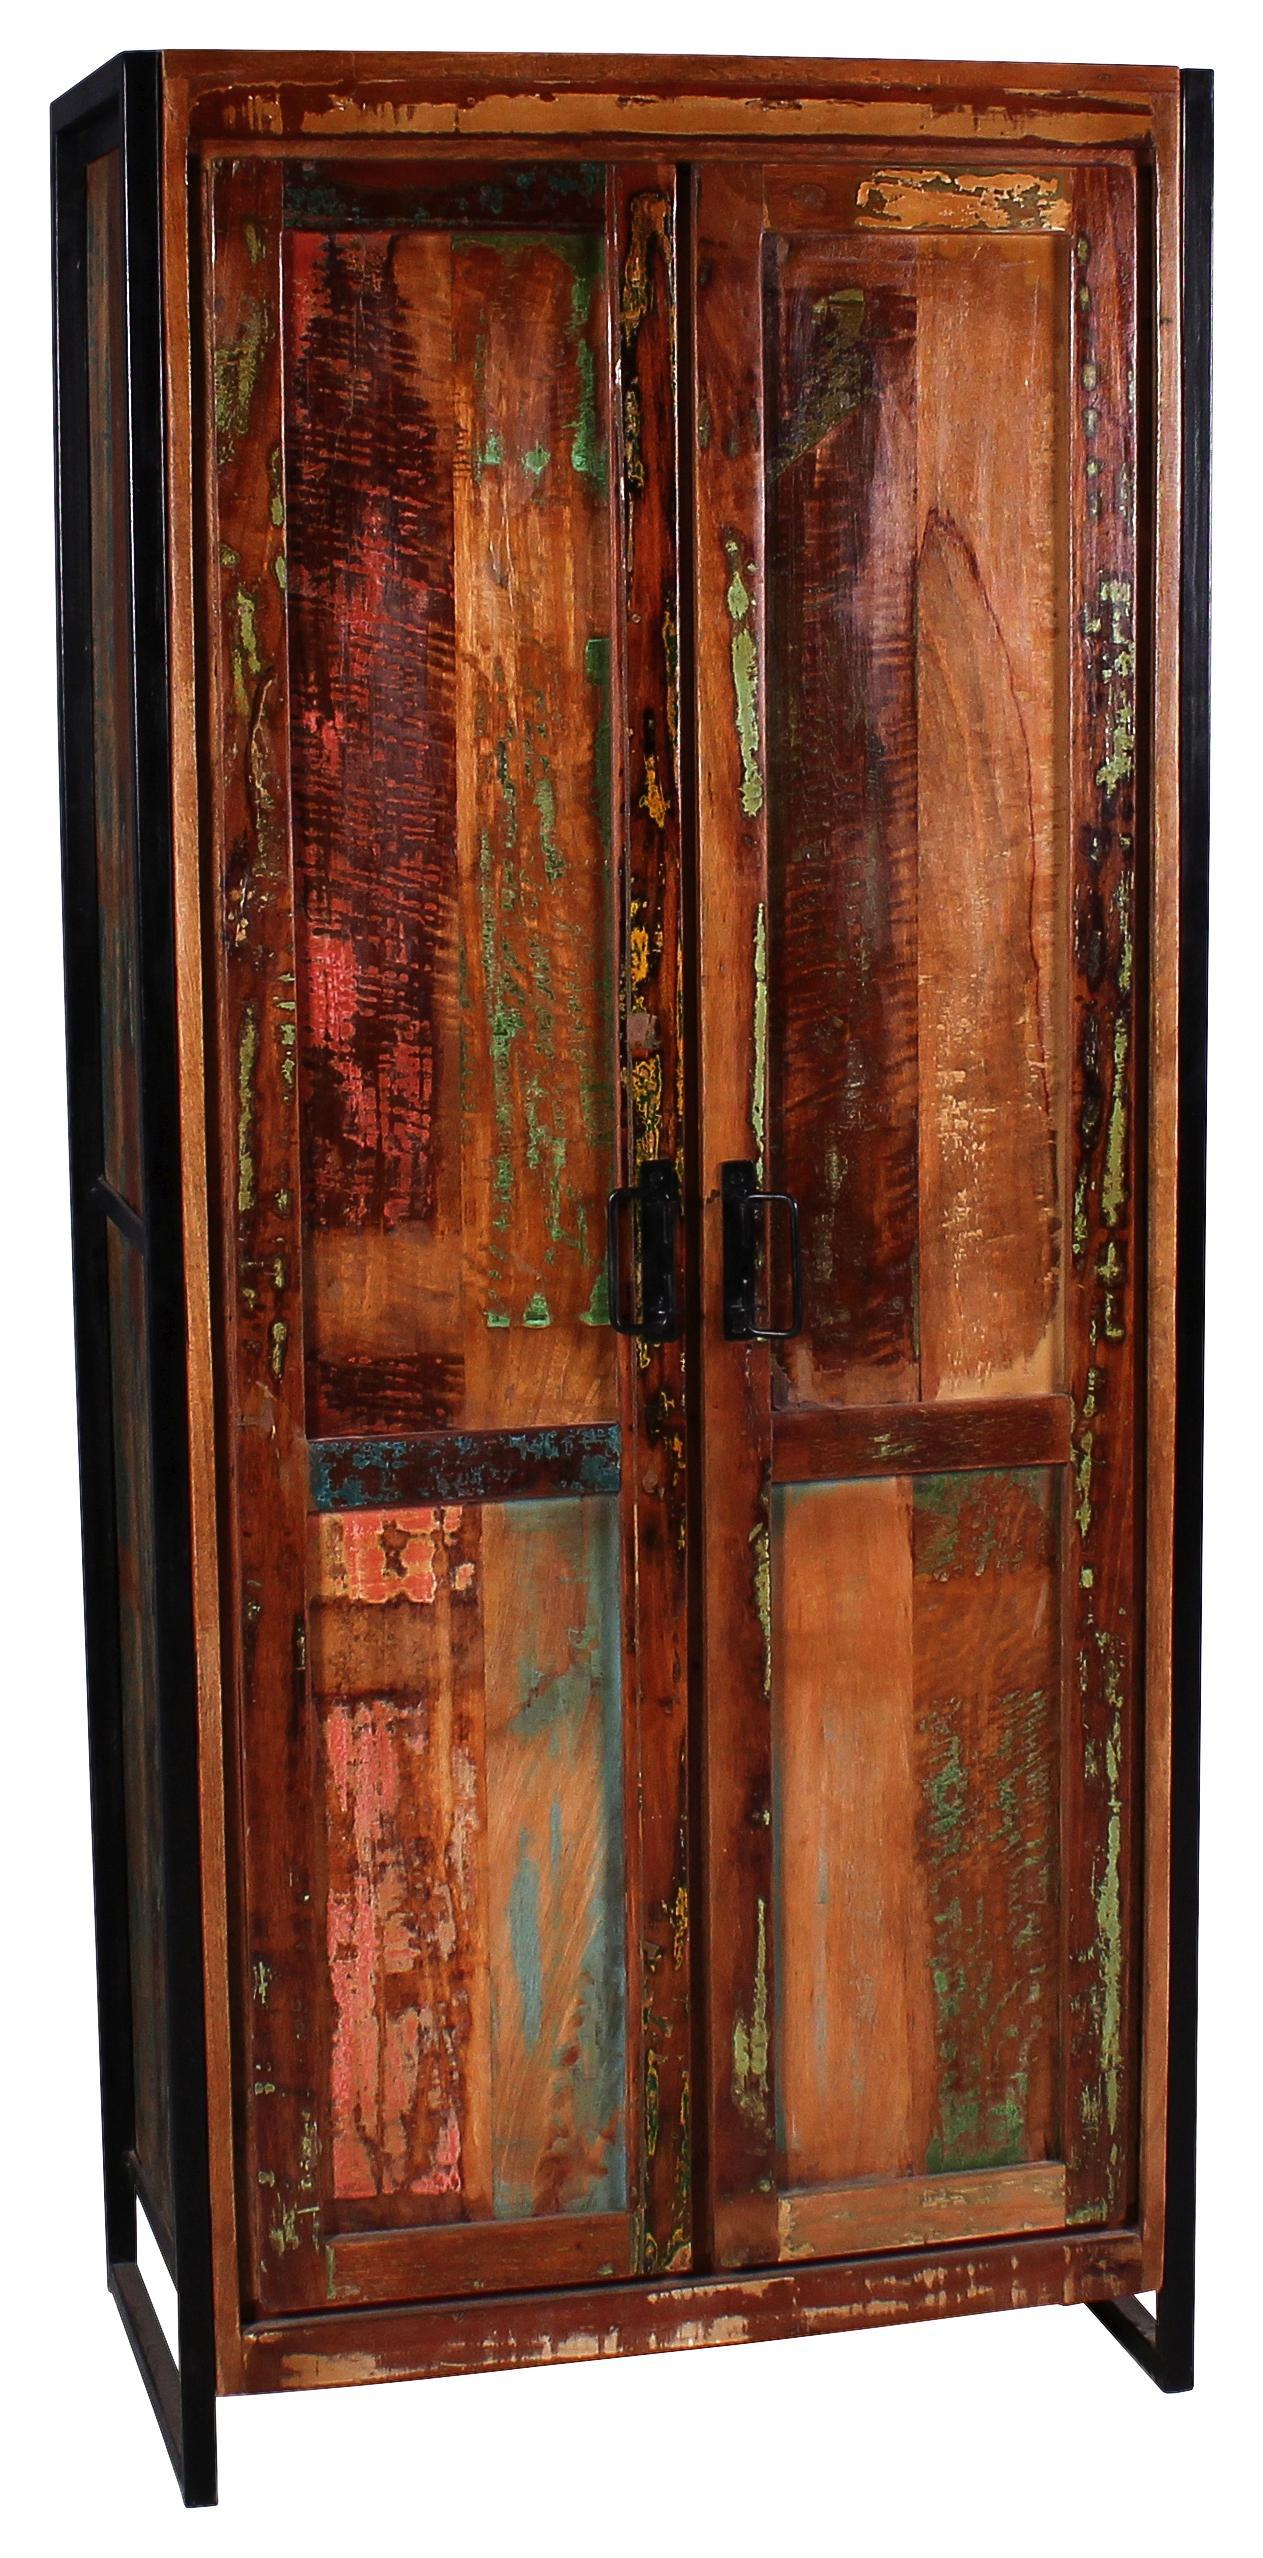 Garderobenschrank Aus Recyclingholz Entdecken